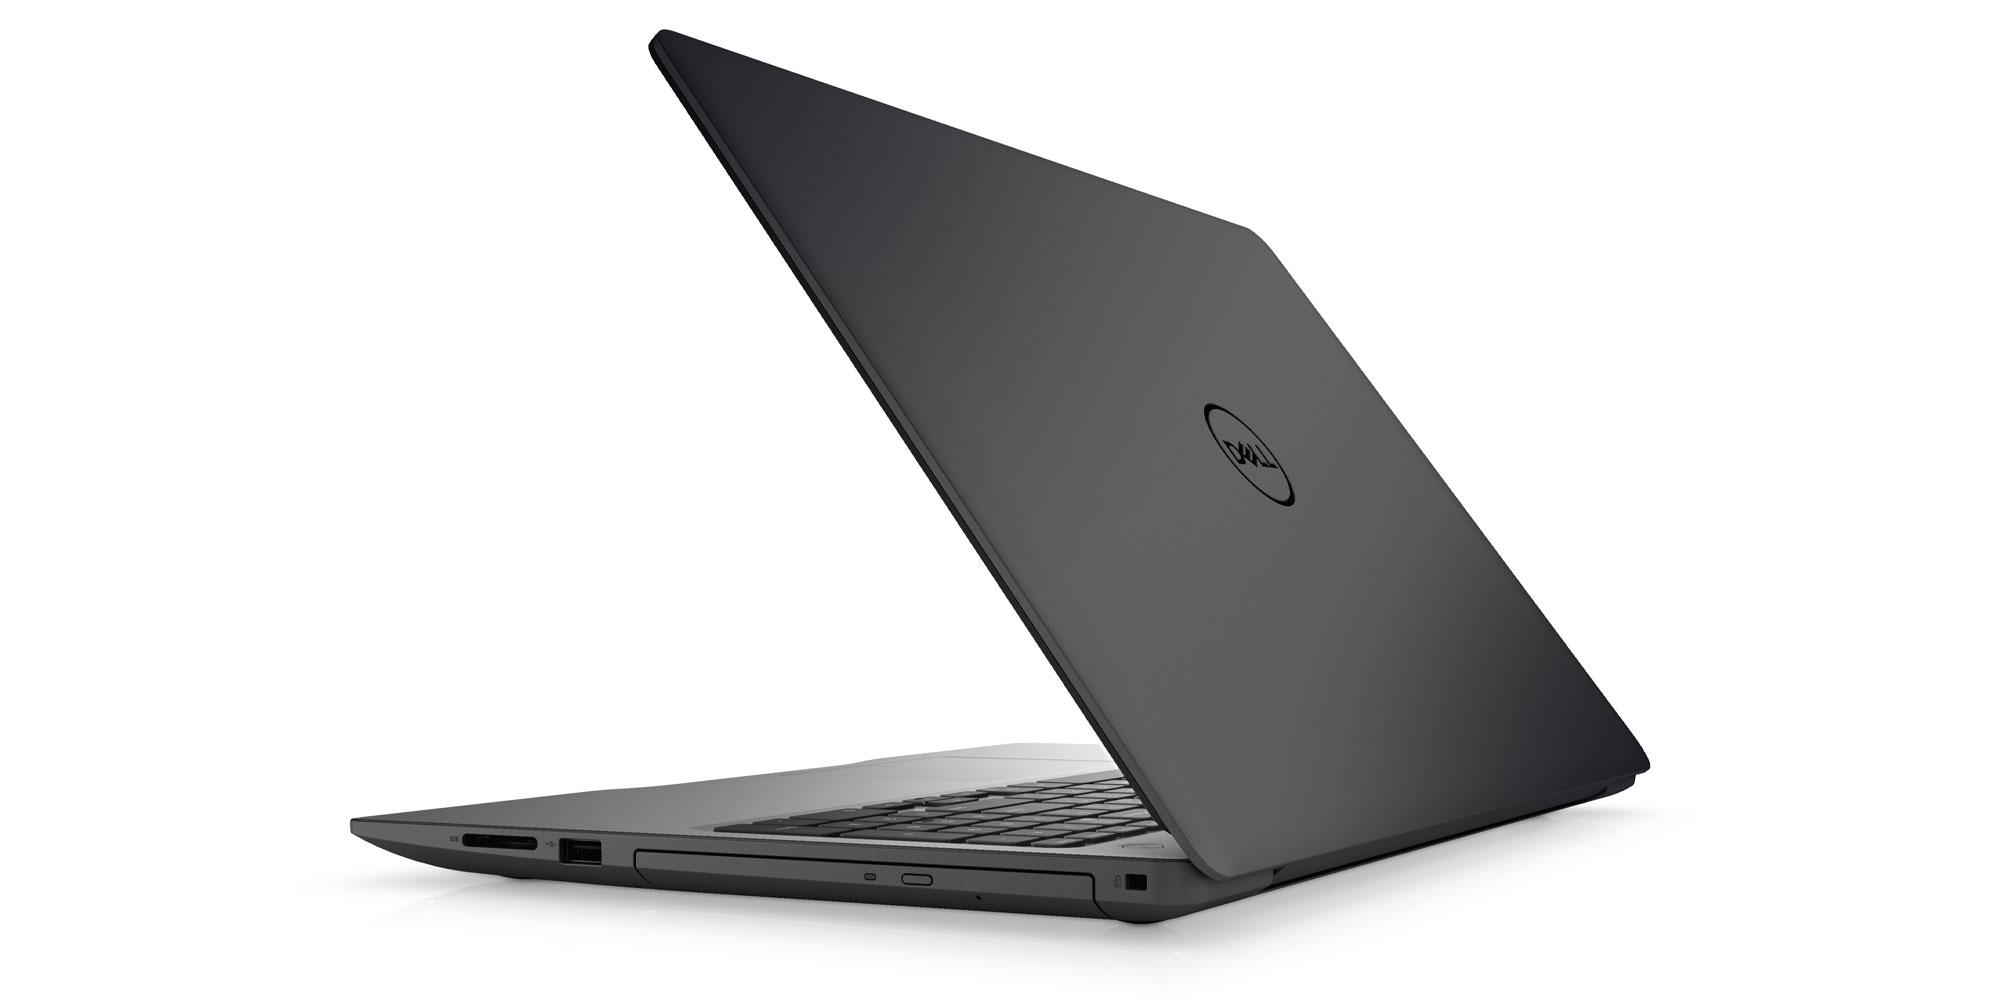 Dell's Inspiron 5000 laptop packs a Ryzen 5 processor, 1TB of storage, more: $379 (Reg. $500+)